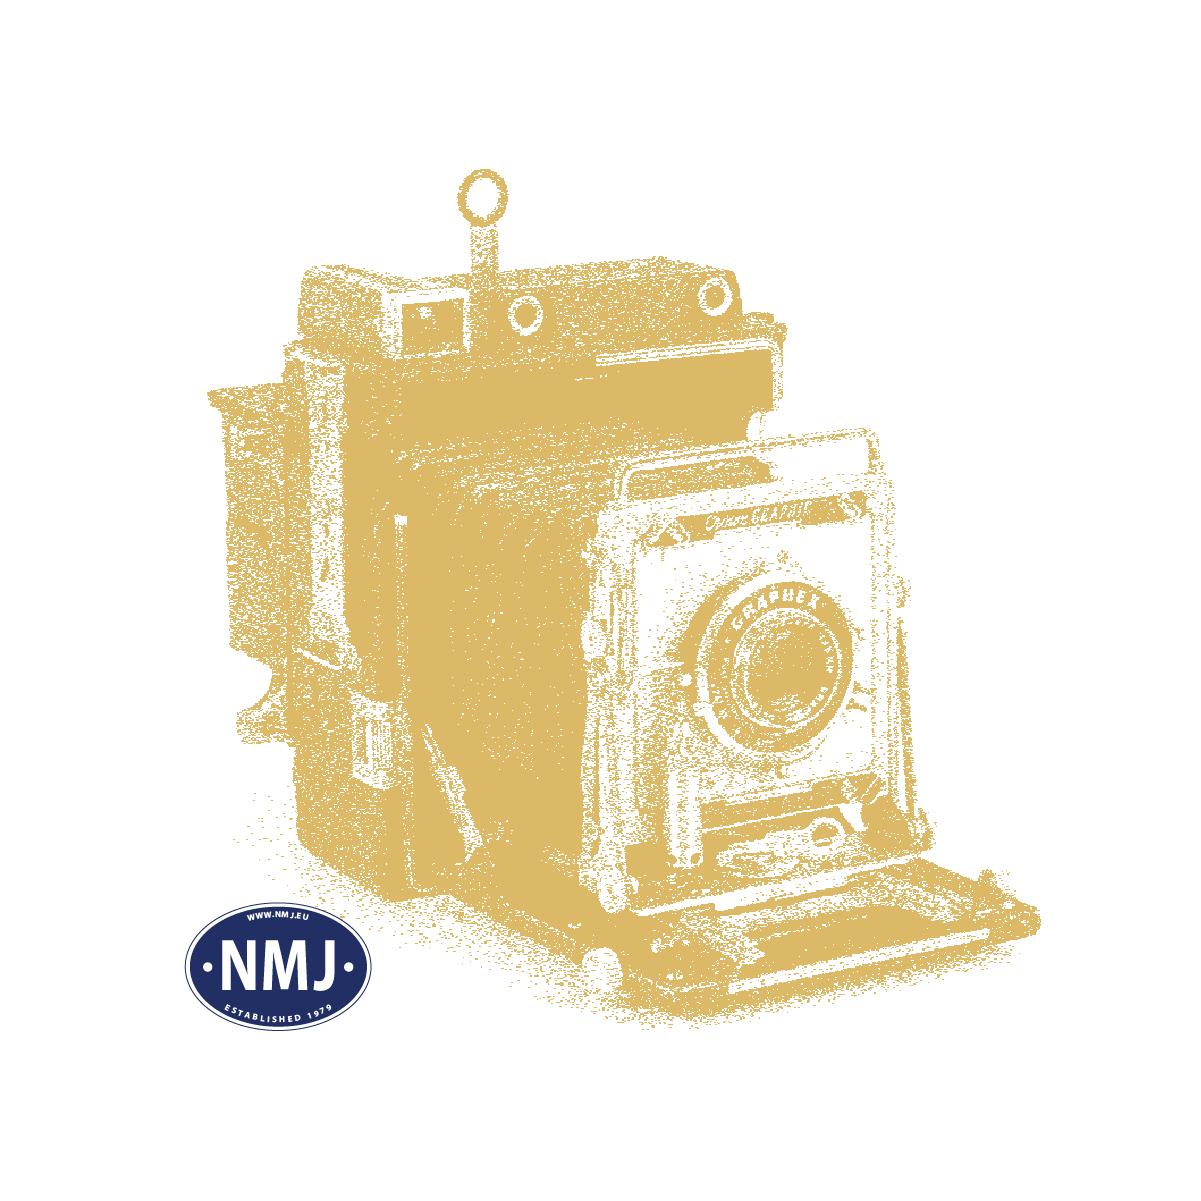 NOC60135 - Gras-Master 2.0, 20 KV